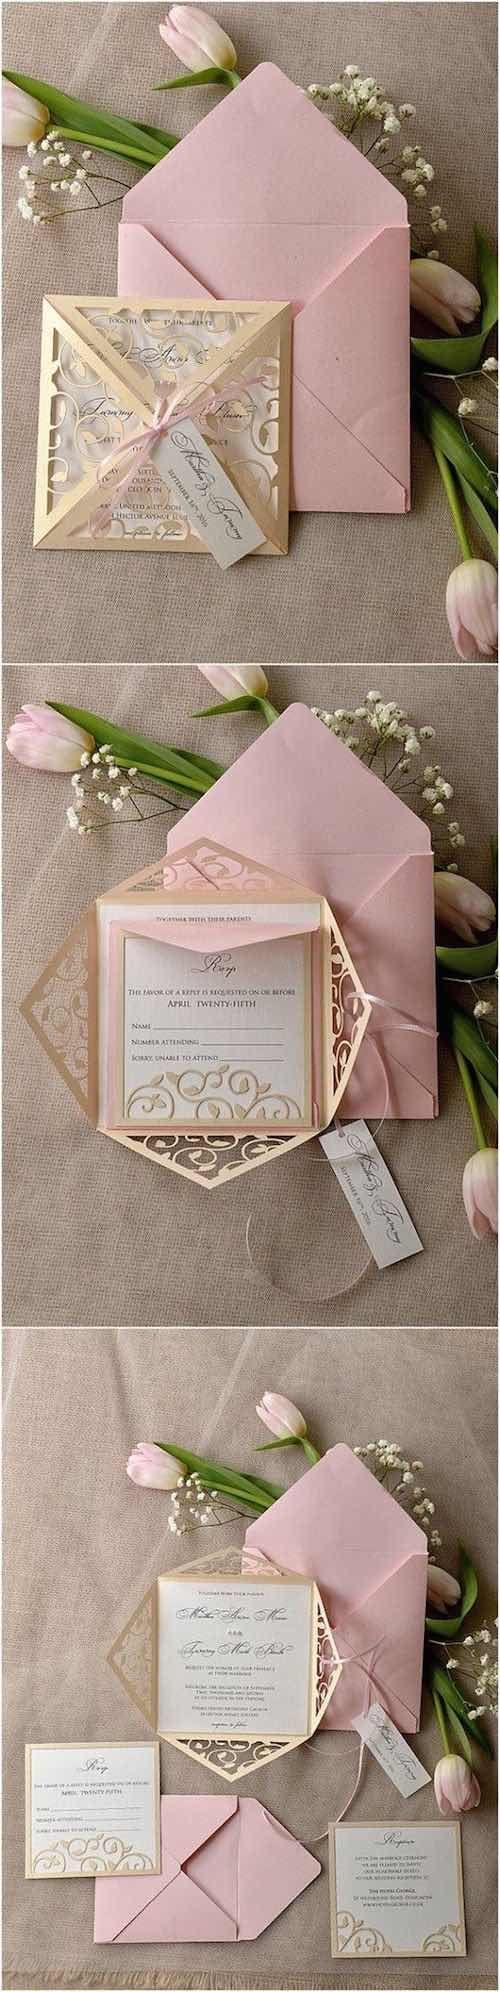 wedding invitation tied with ribbon%0A wedding Invitations for your fairytale wedding  weddinginvitation